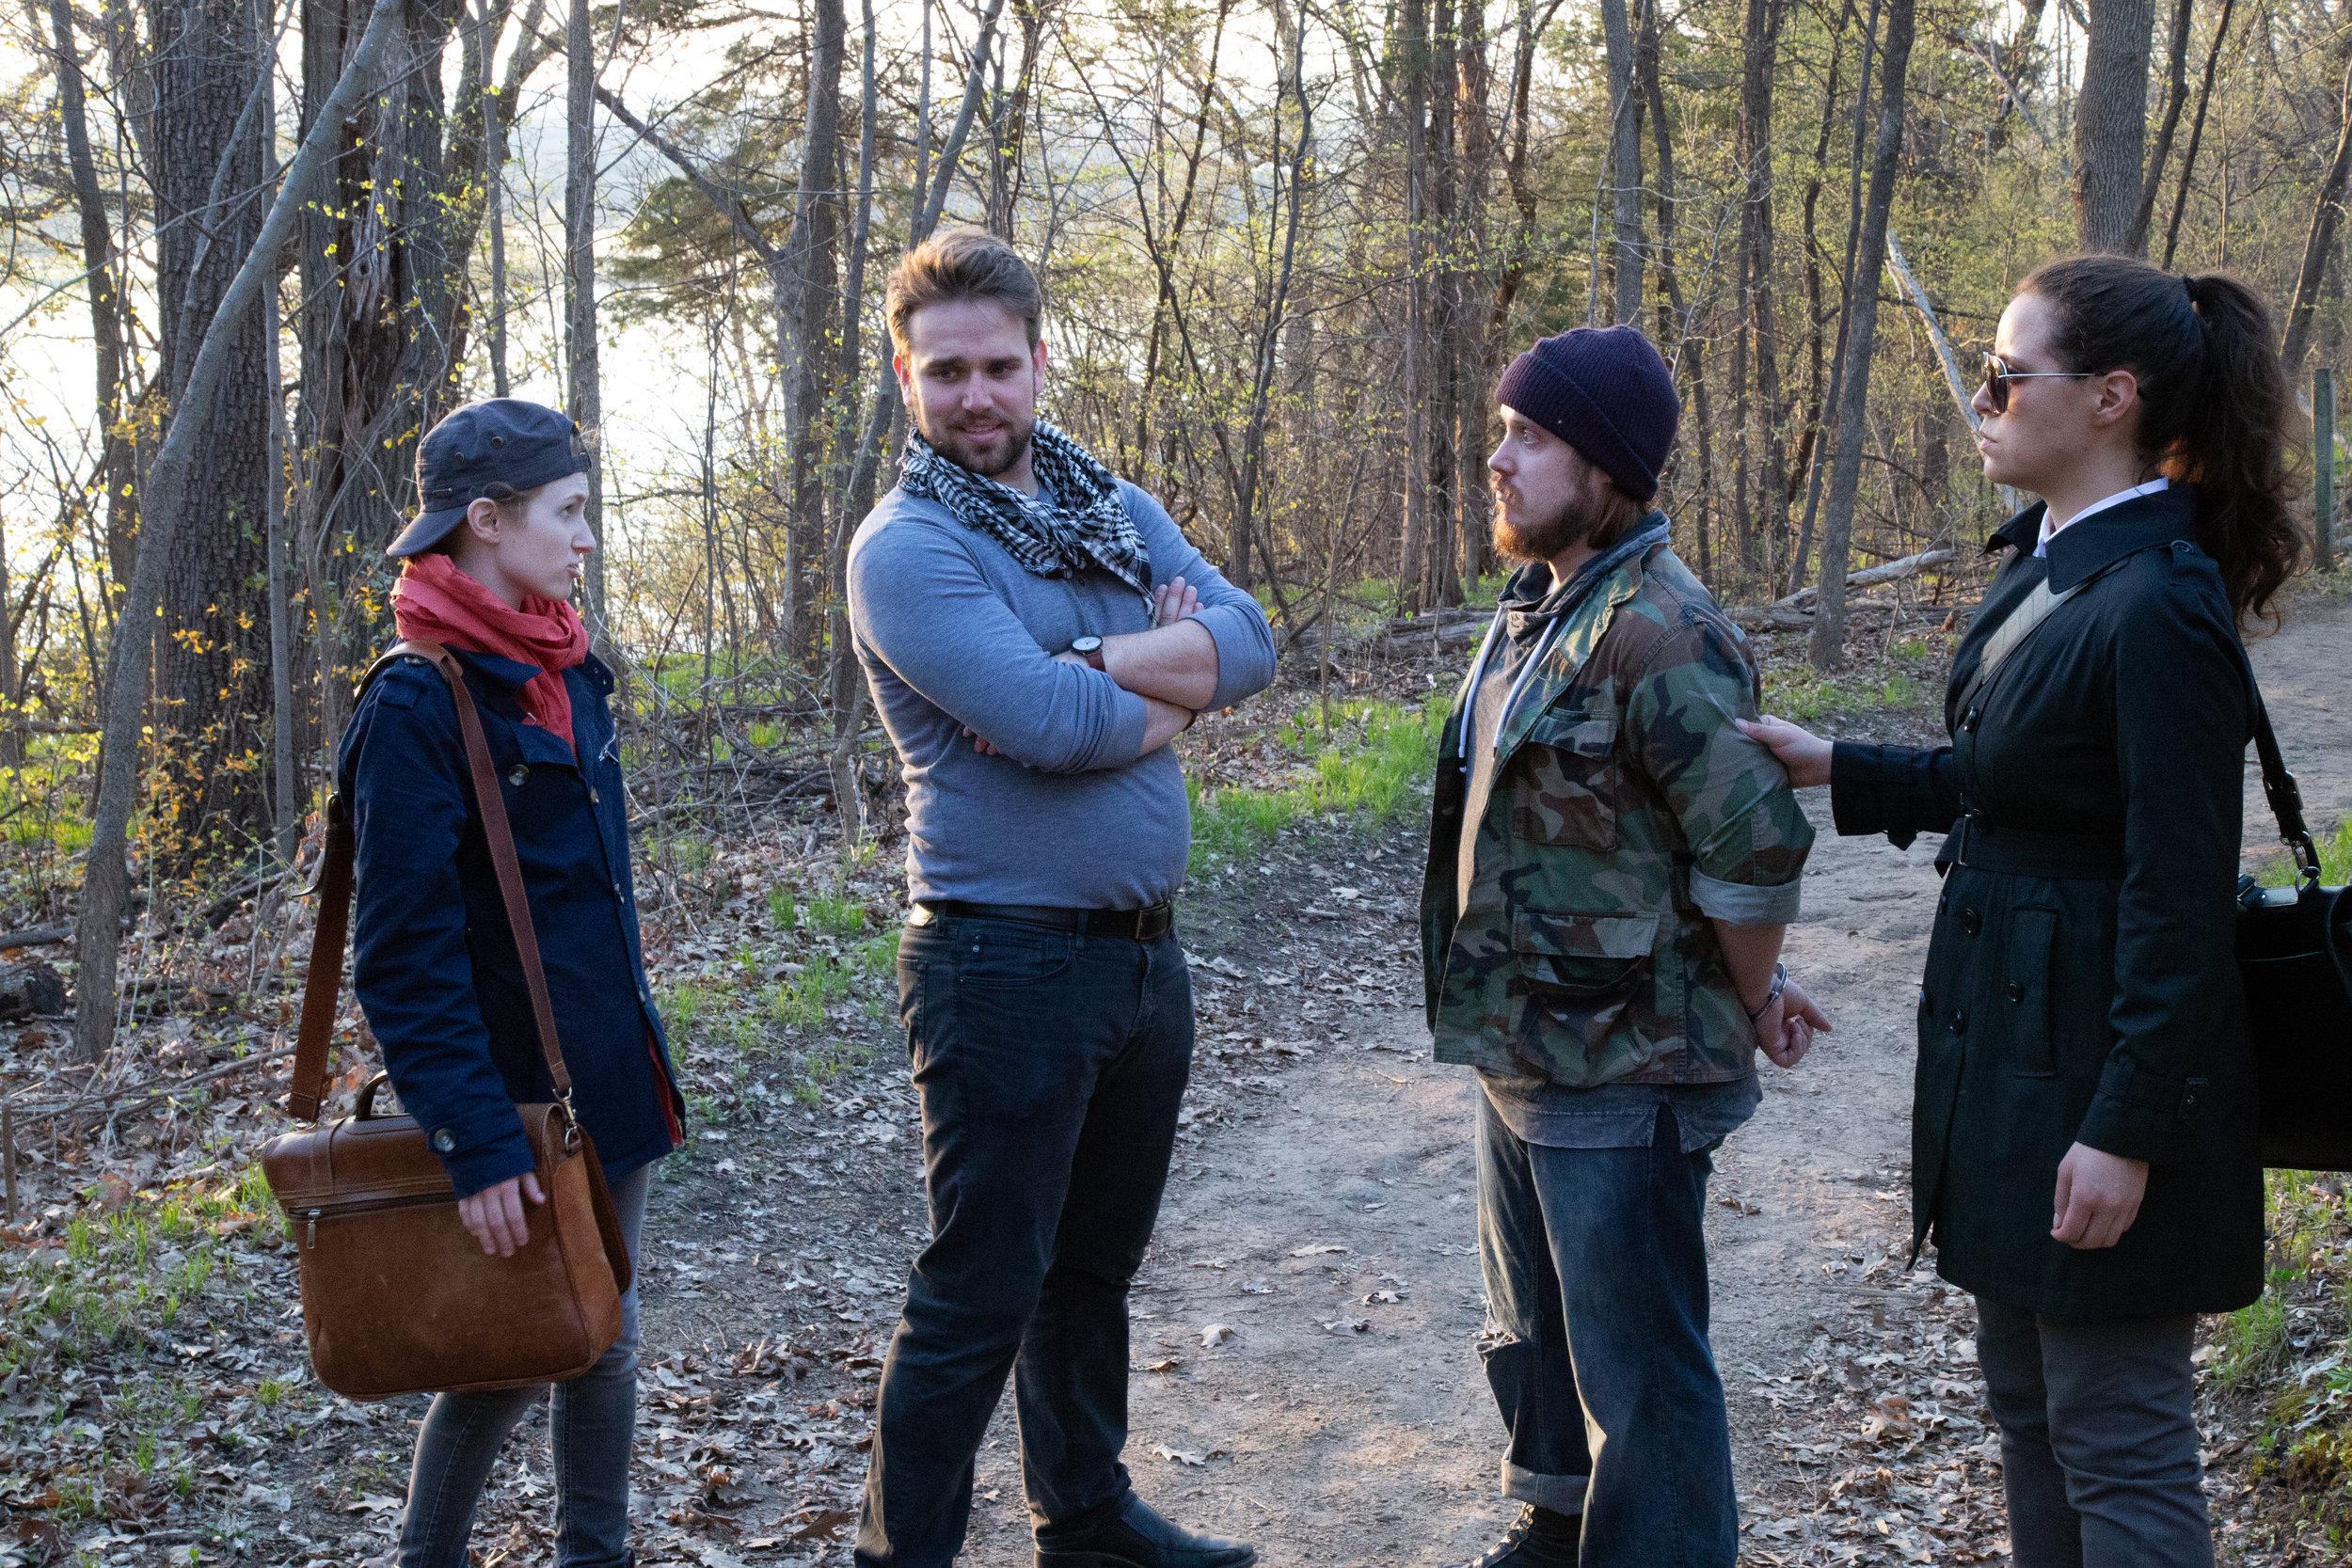 Viola (Leah Christine), Orsino (Henry Southwick), Antonio (Zach Filkins) and Officer (Michelle Del)